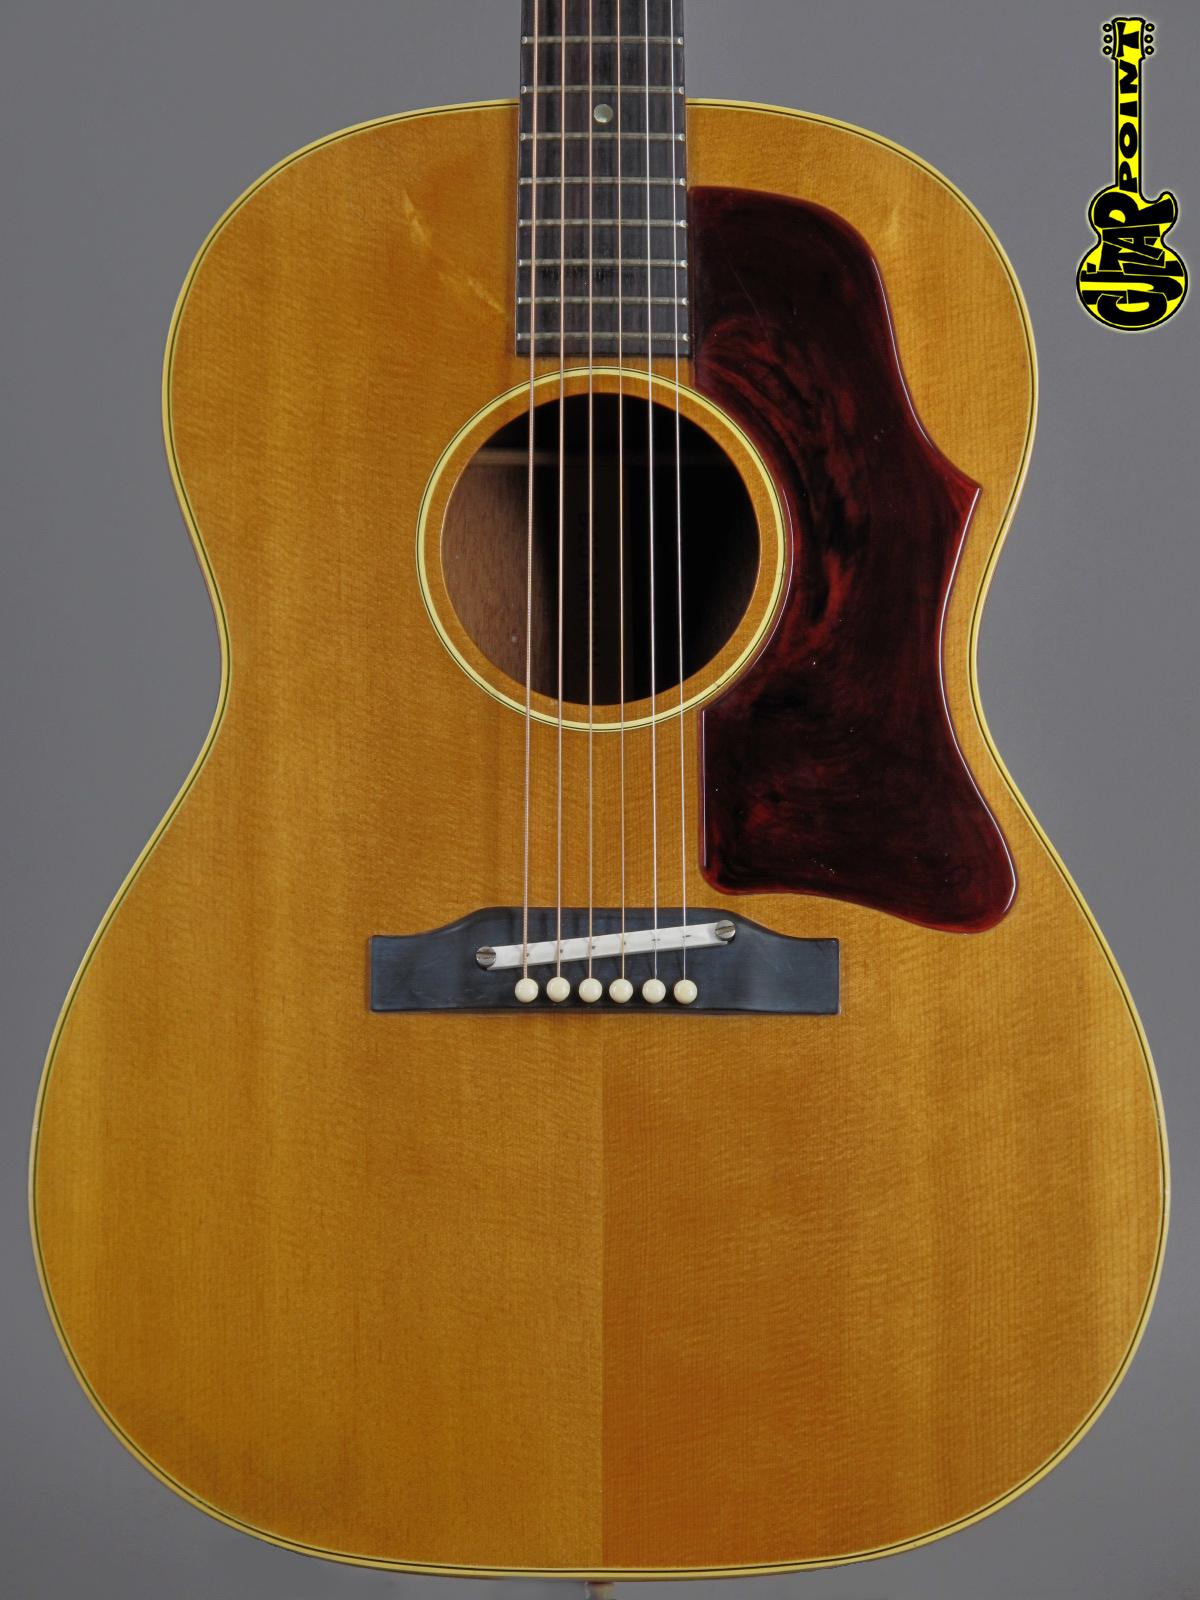 1964 Gibson B-25 N - Natural